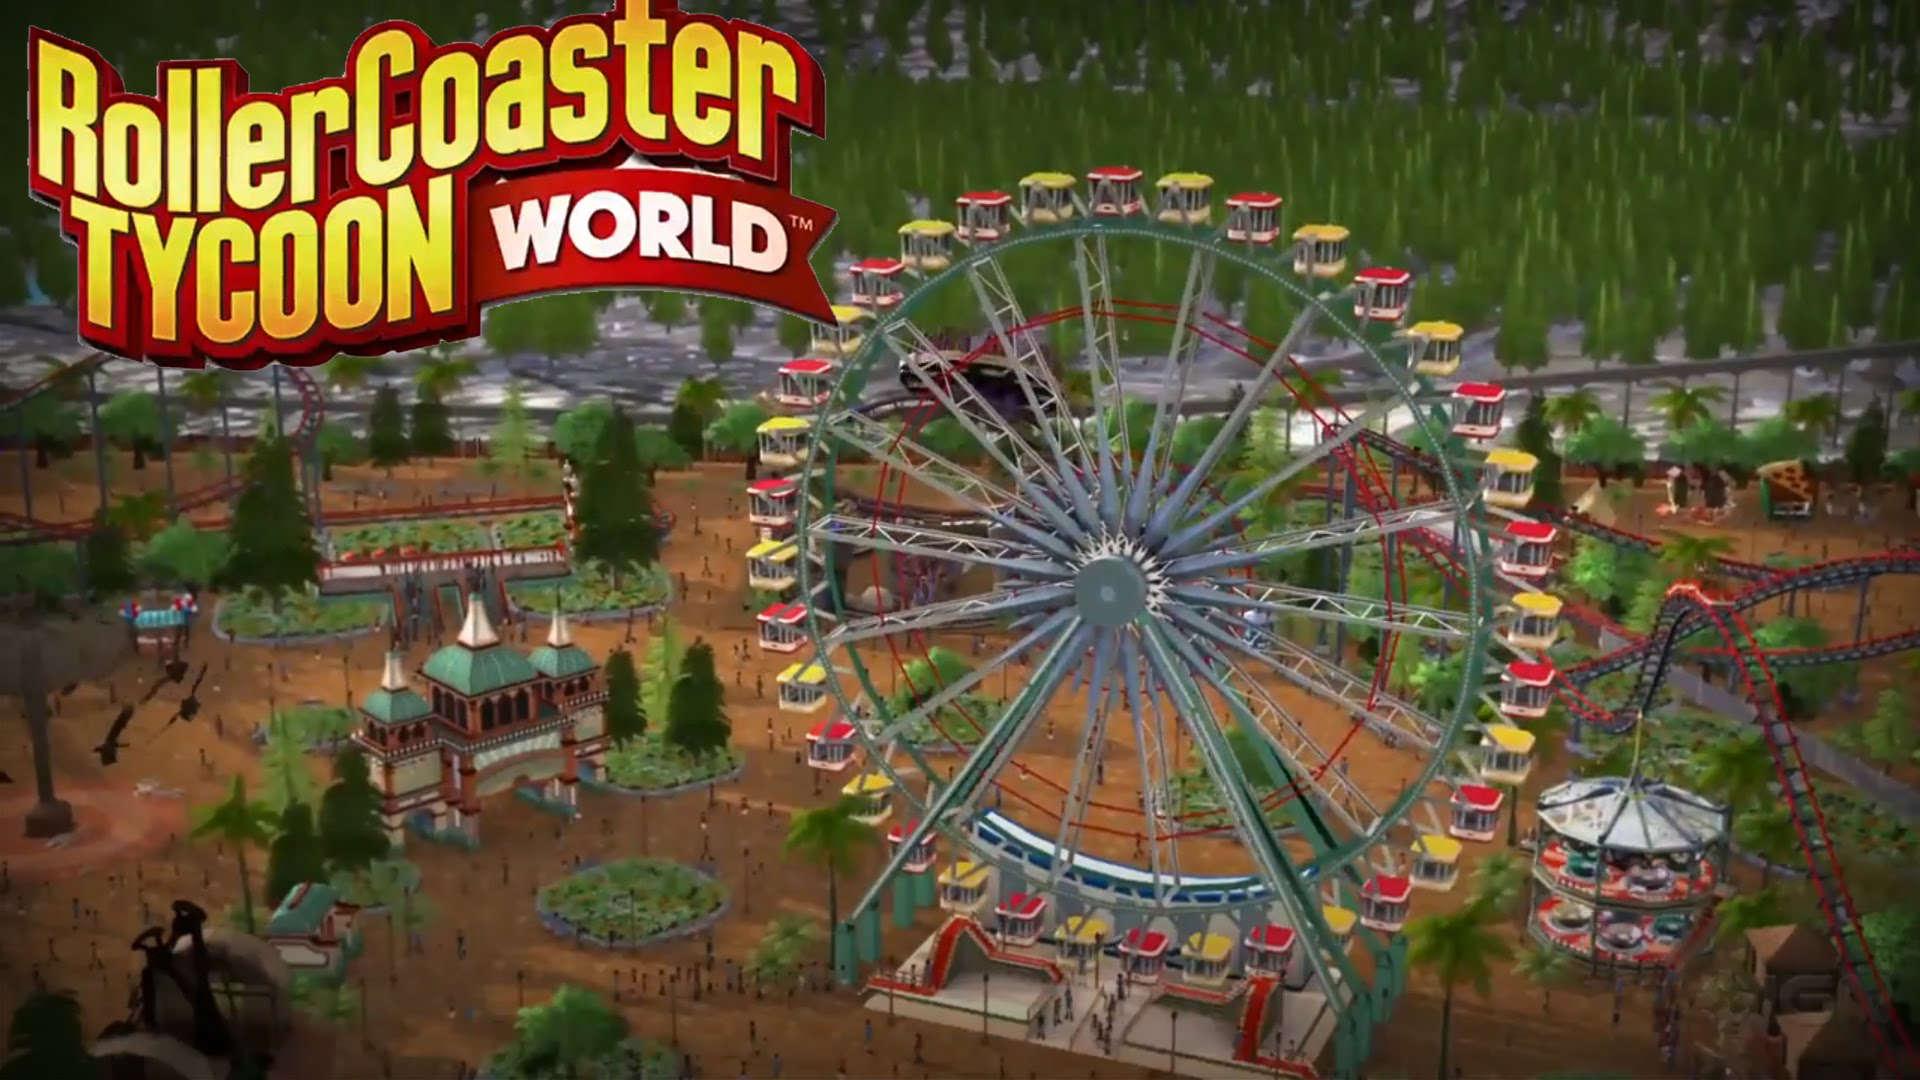 Rollercoaster Tycoon World Gameplay Trailer